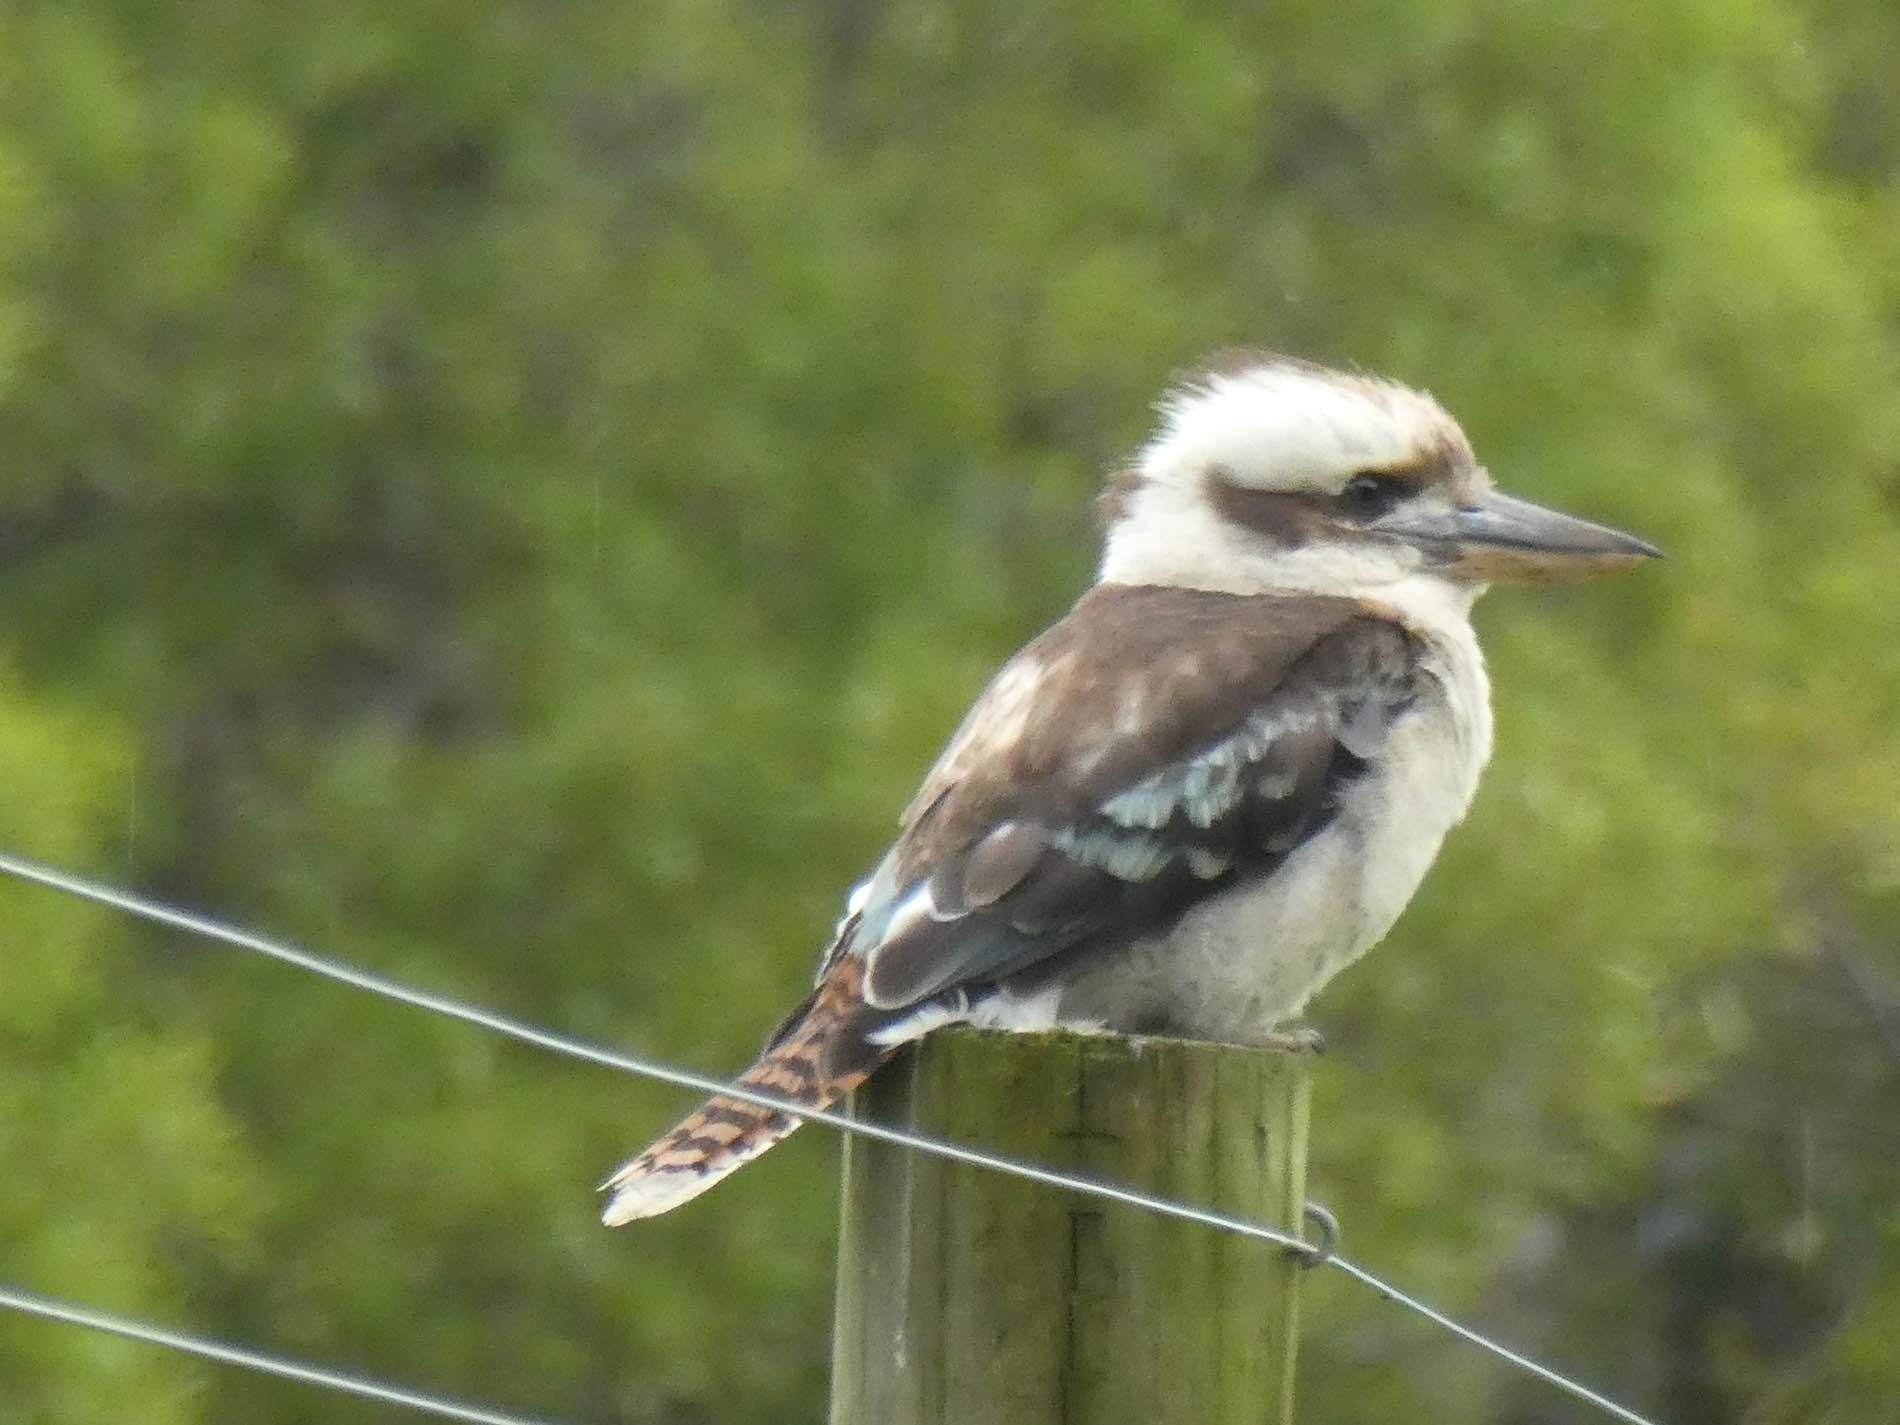 Young kookaburra on fencepost at Red Hill Ridge